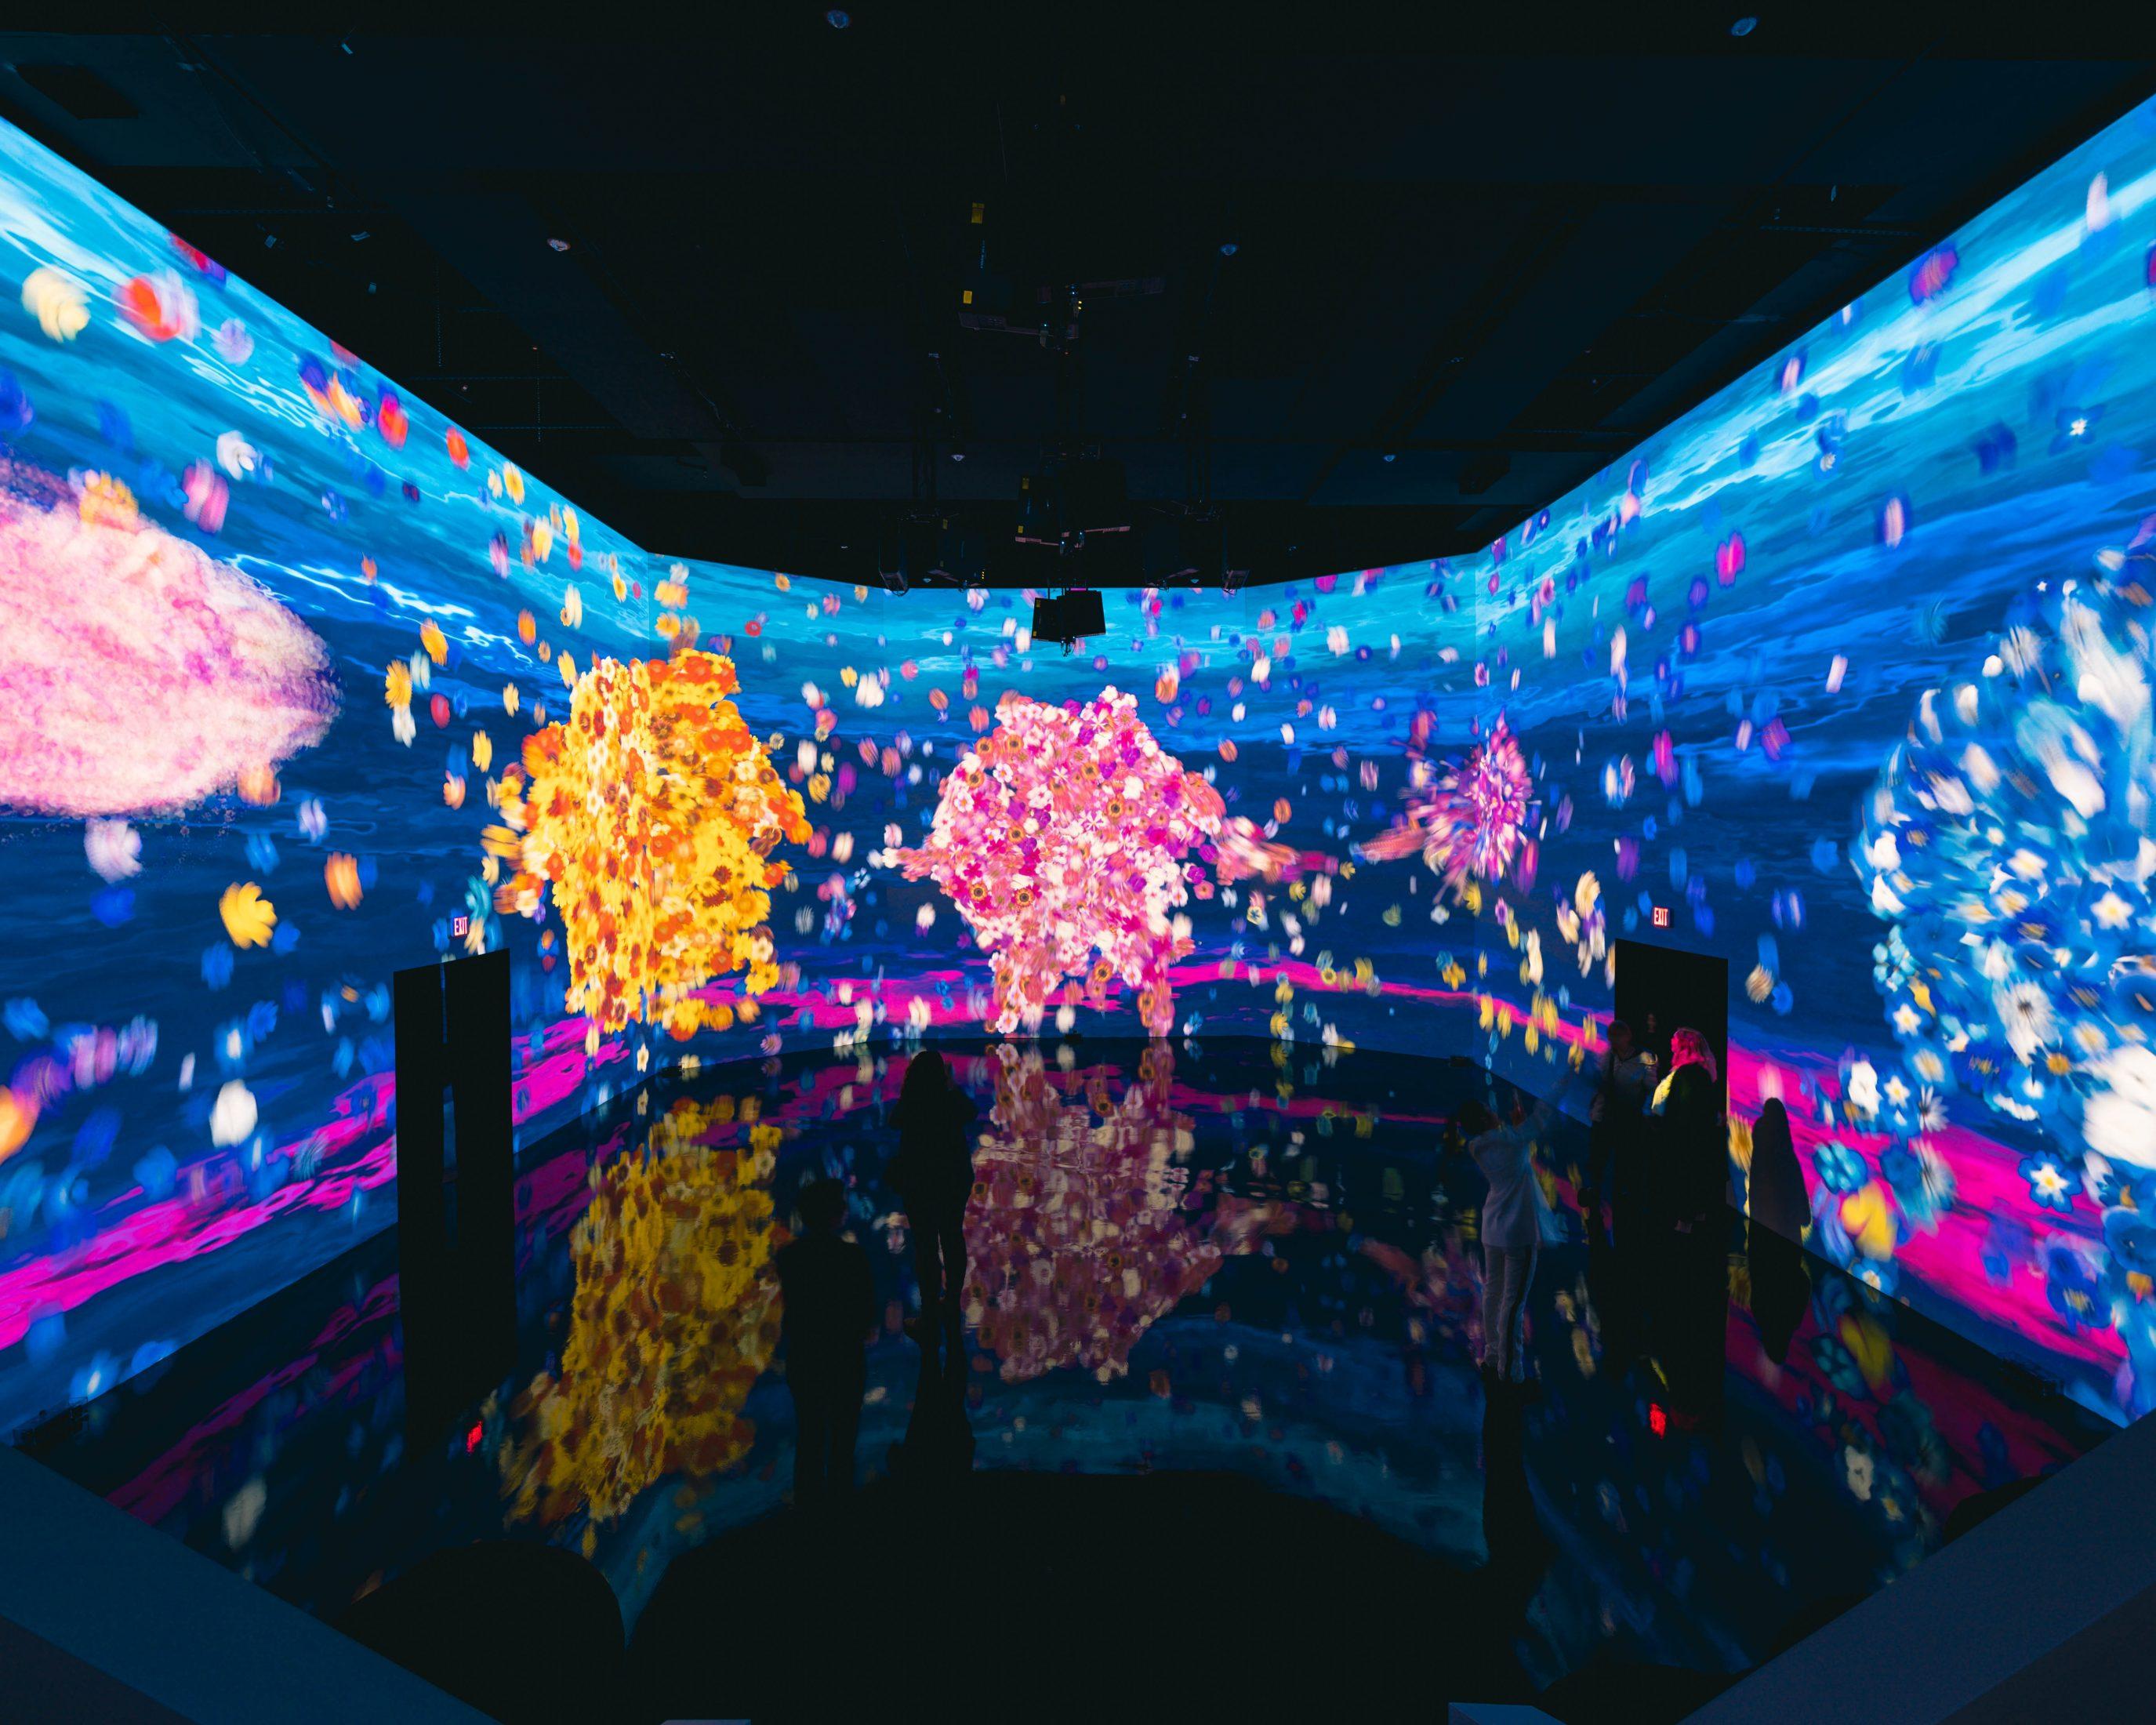 ARTECHOUSE Cherry Blossom Art Installation (Spring 2019)